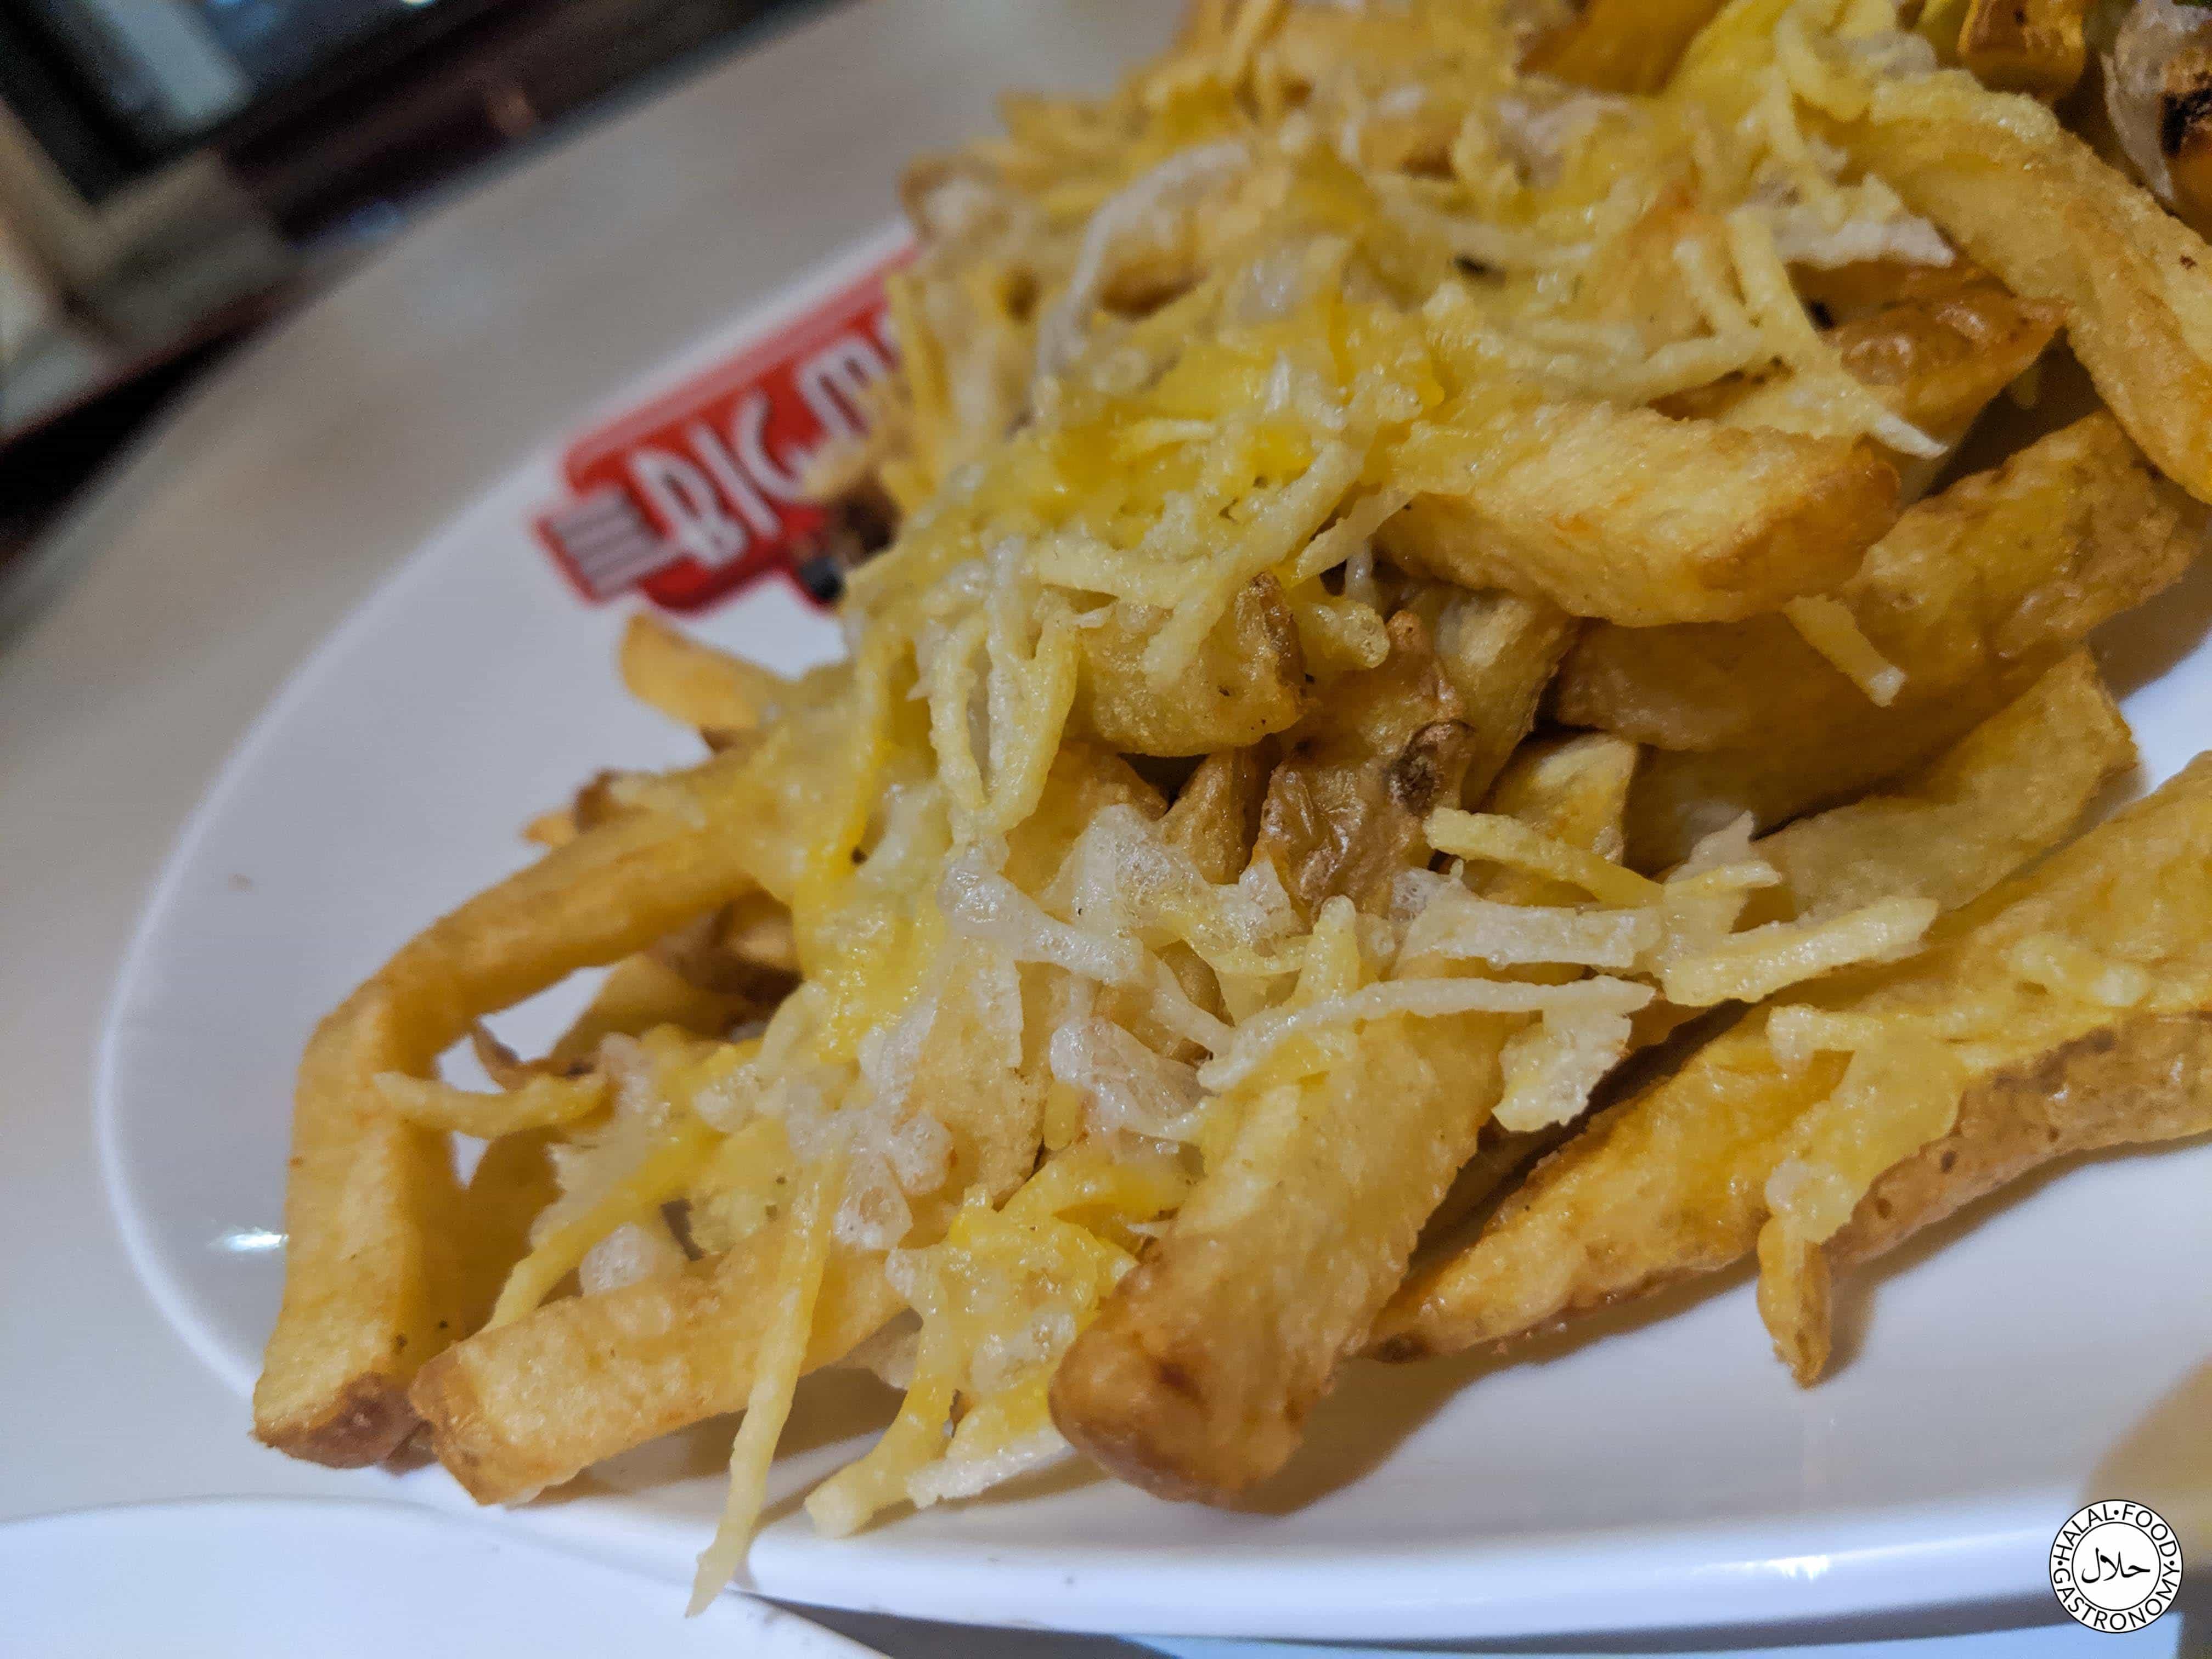 Big Moes Diner The Green Menu Halal Food Gastronomy